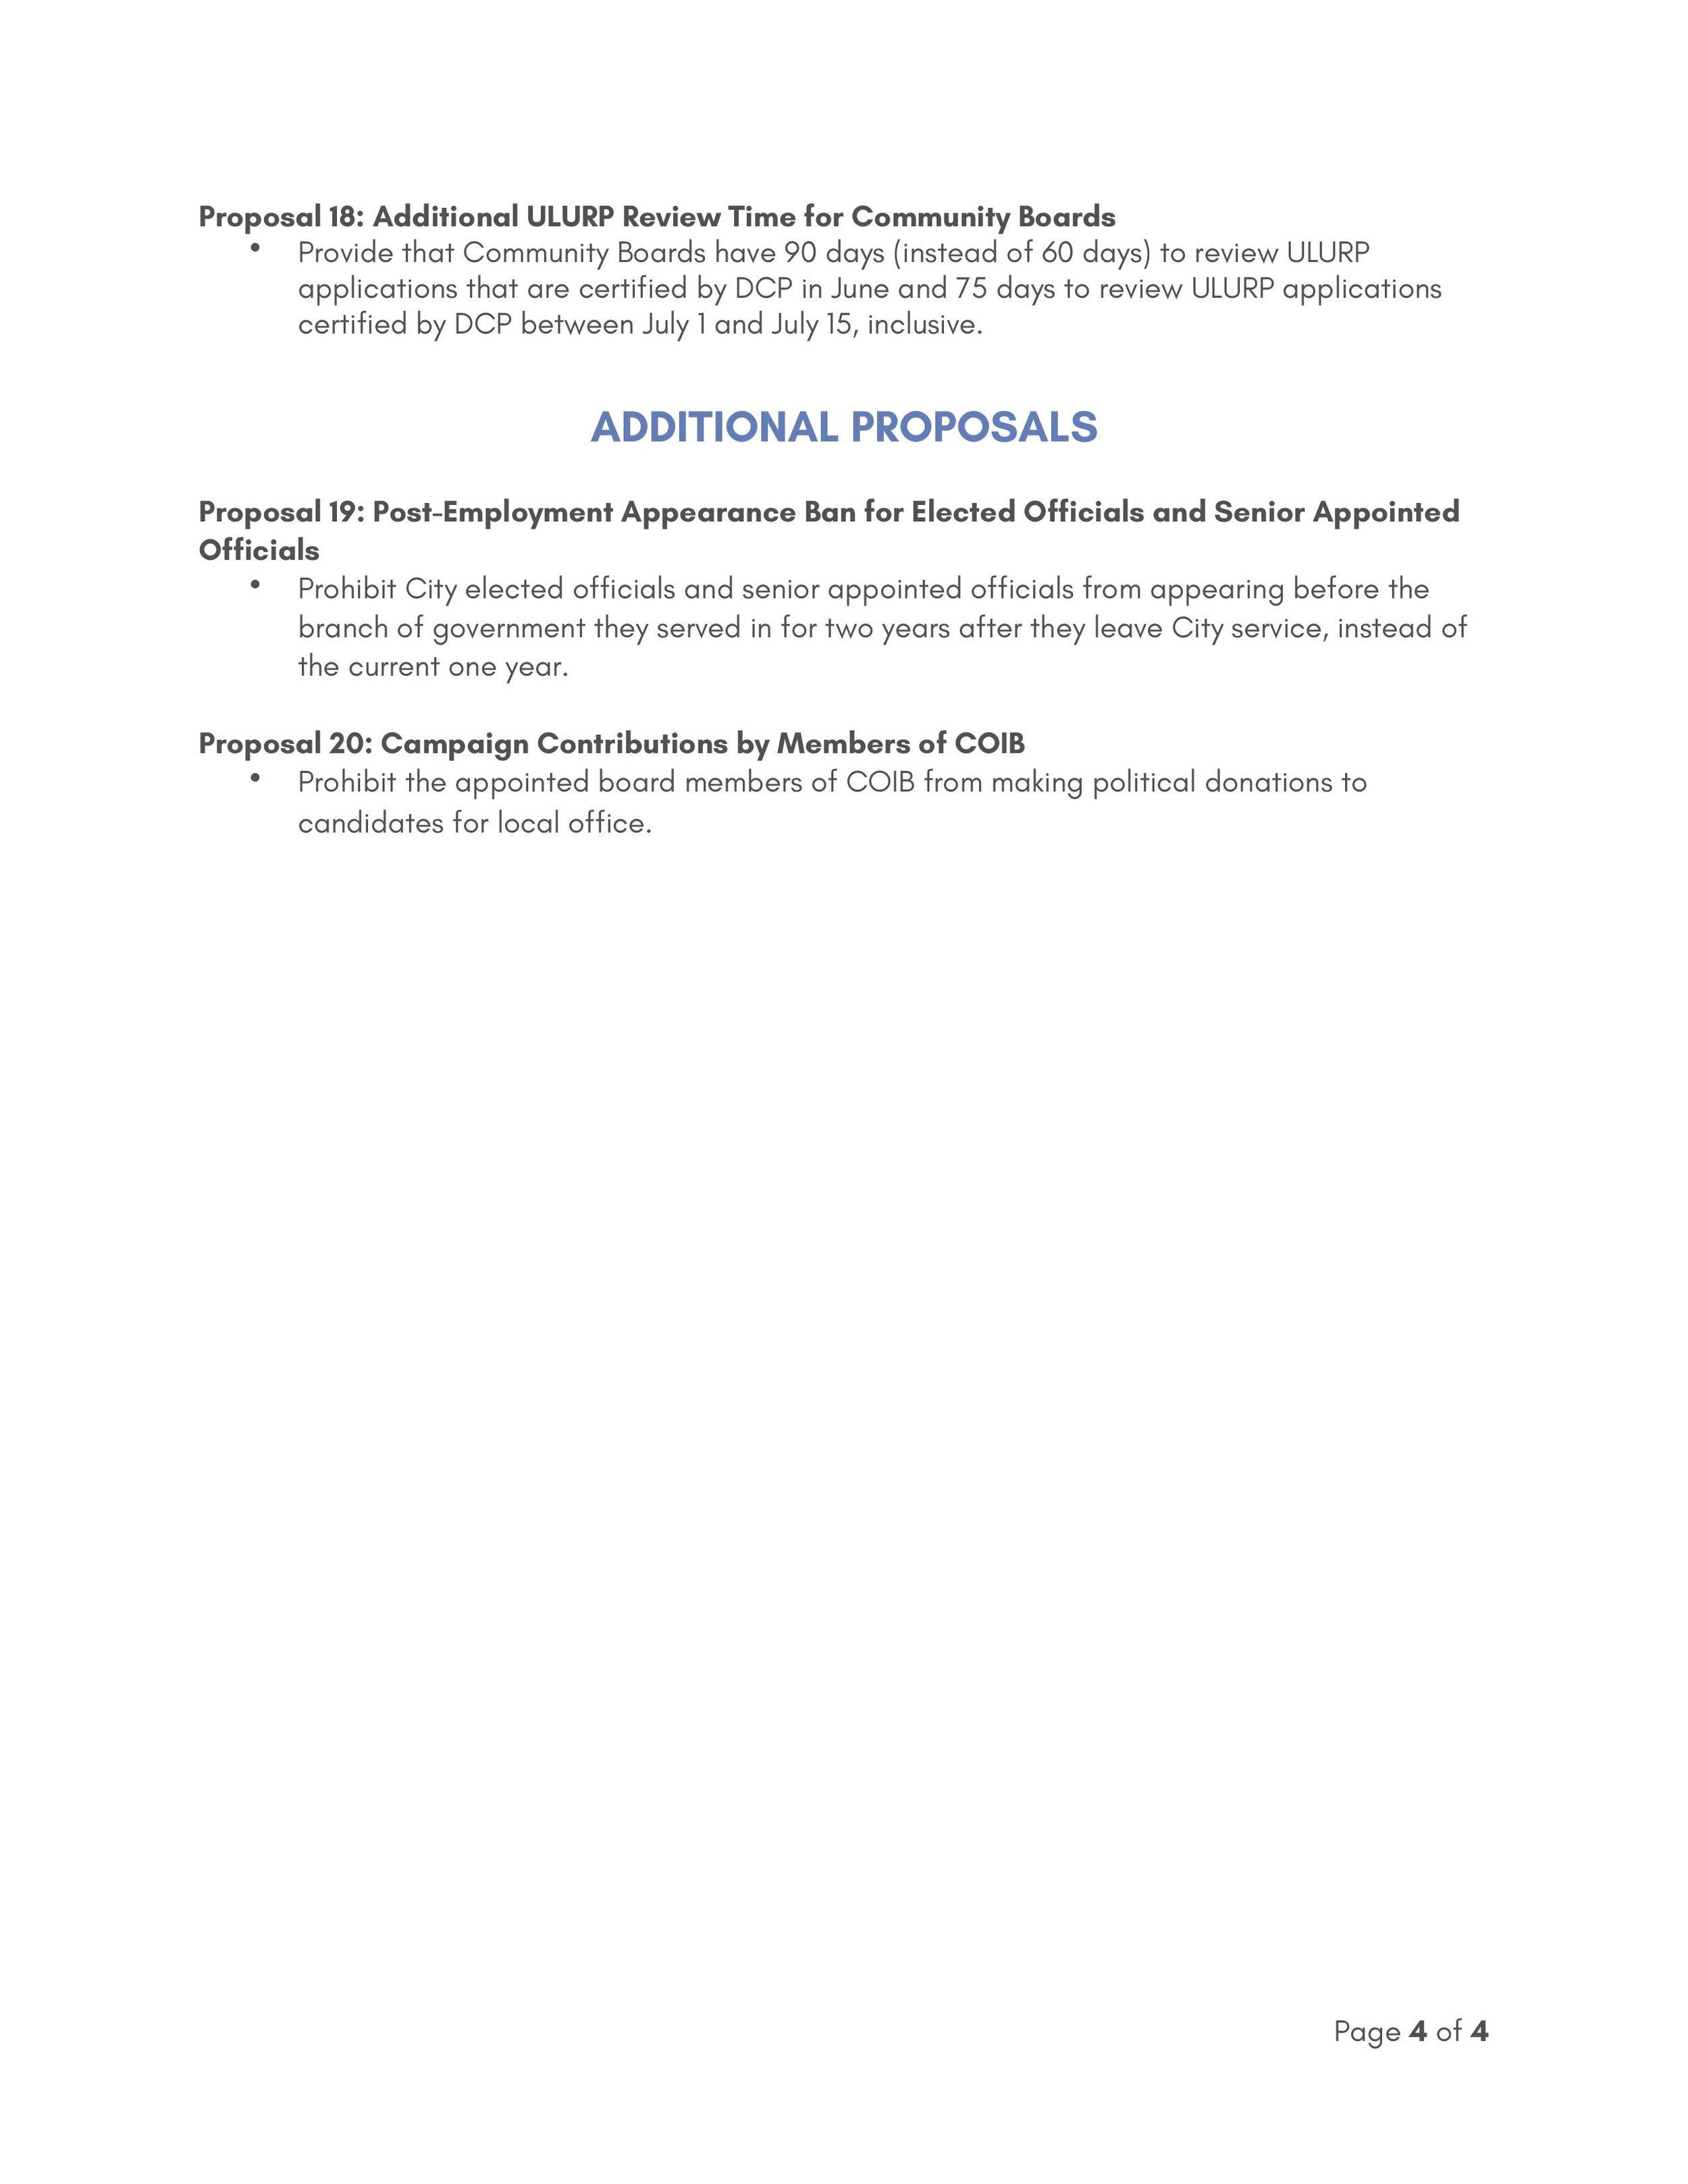 BallotProposals-page-004.jpg